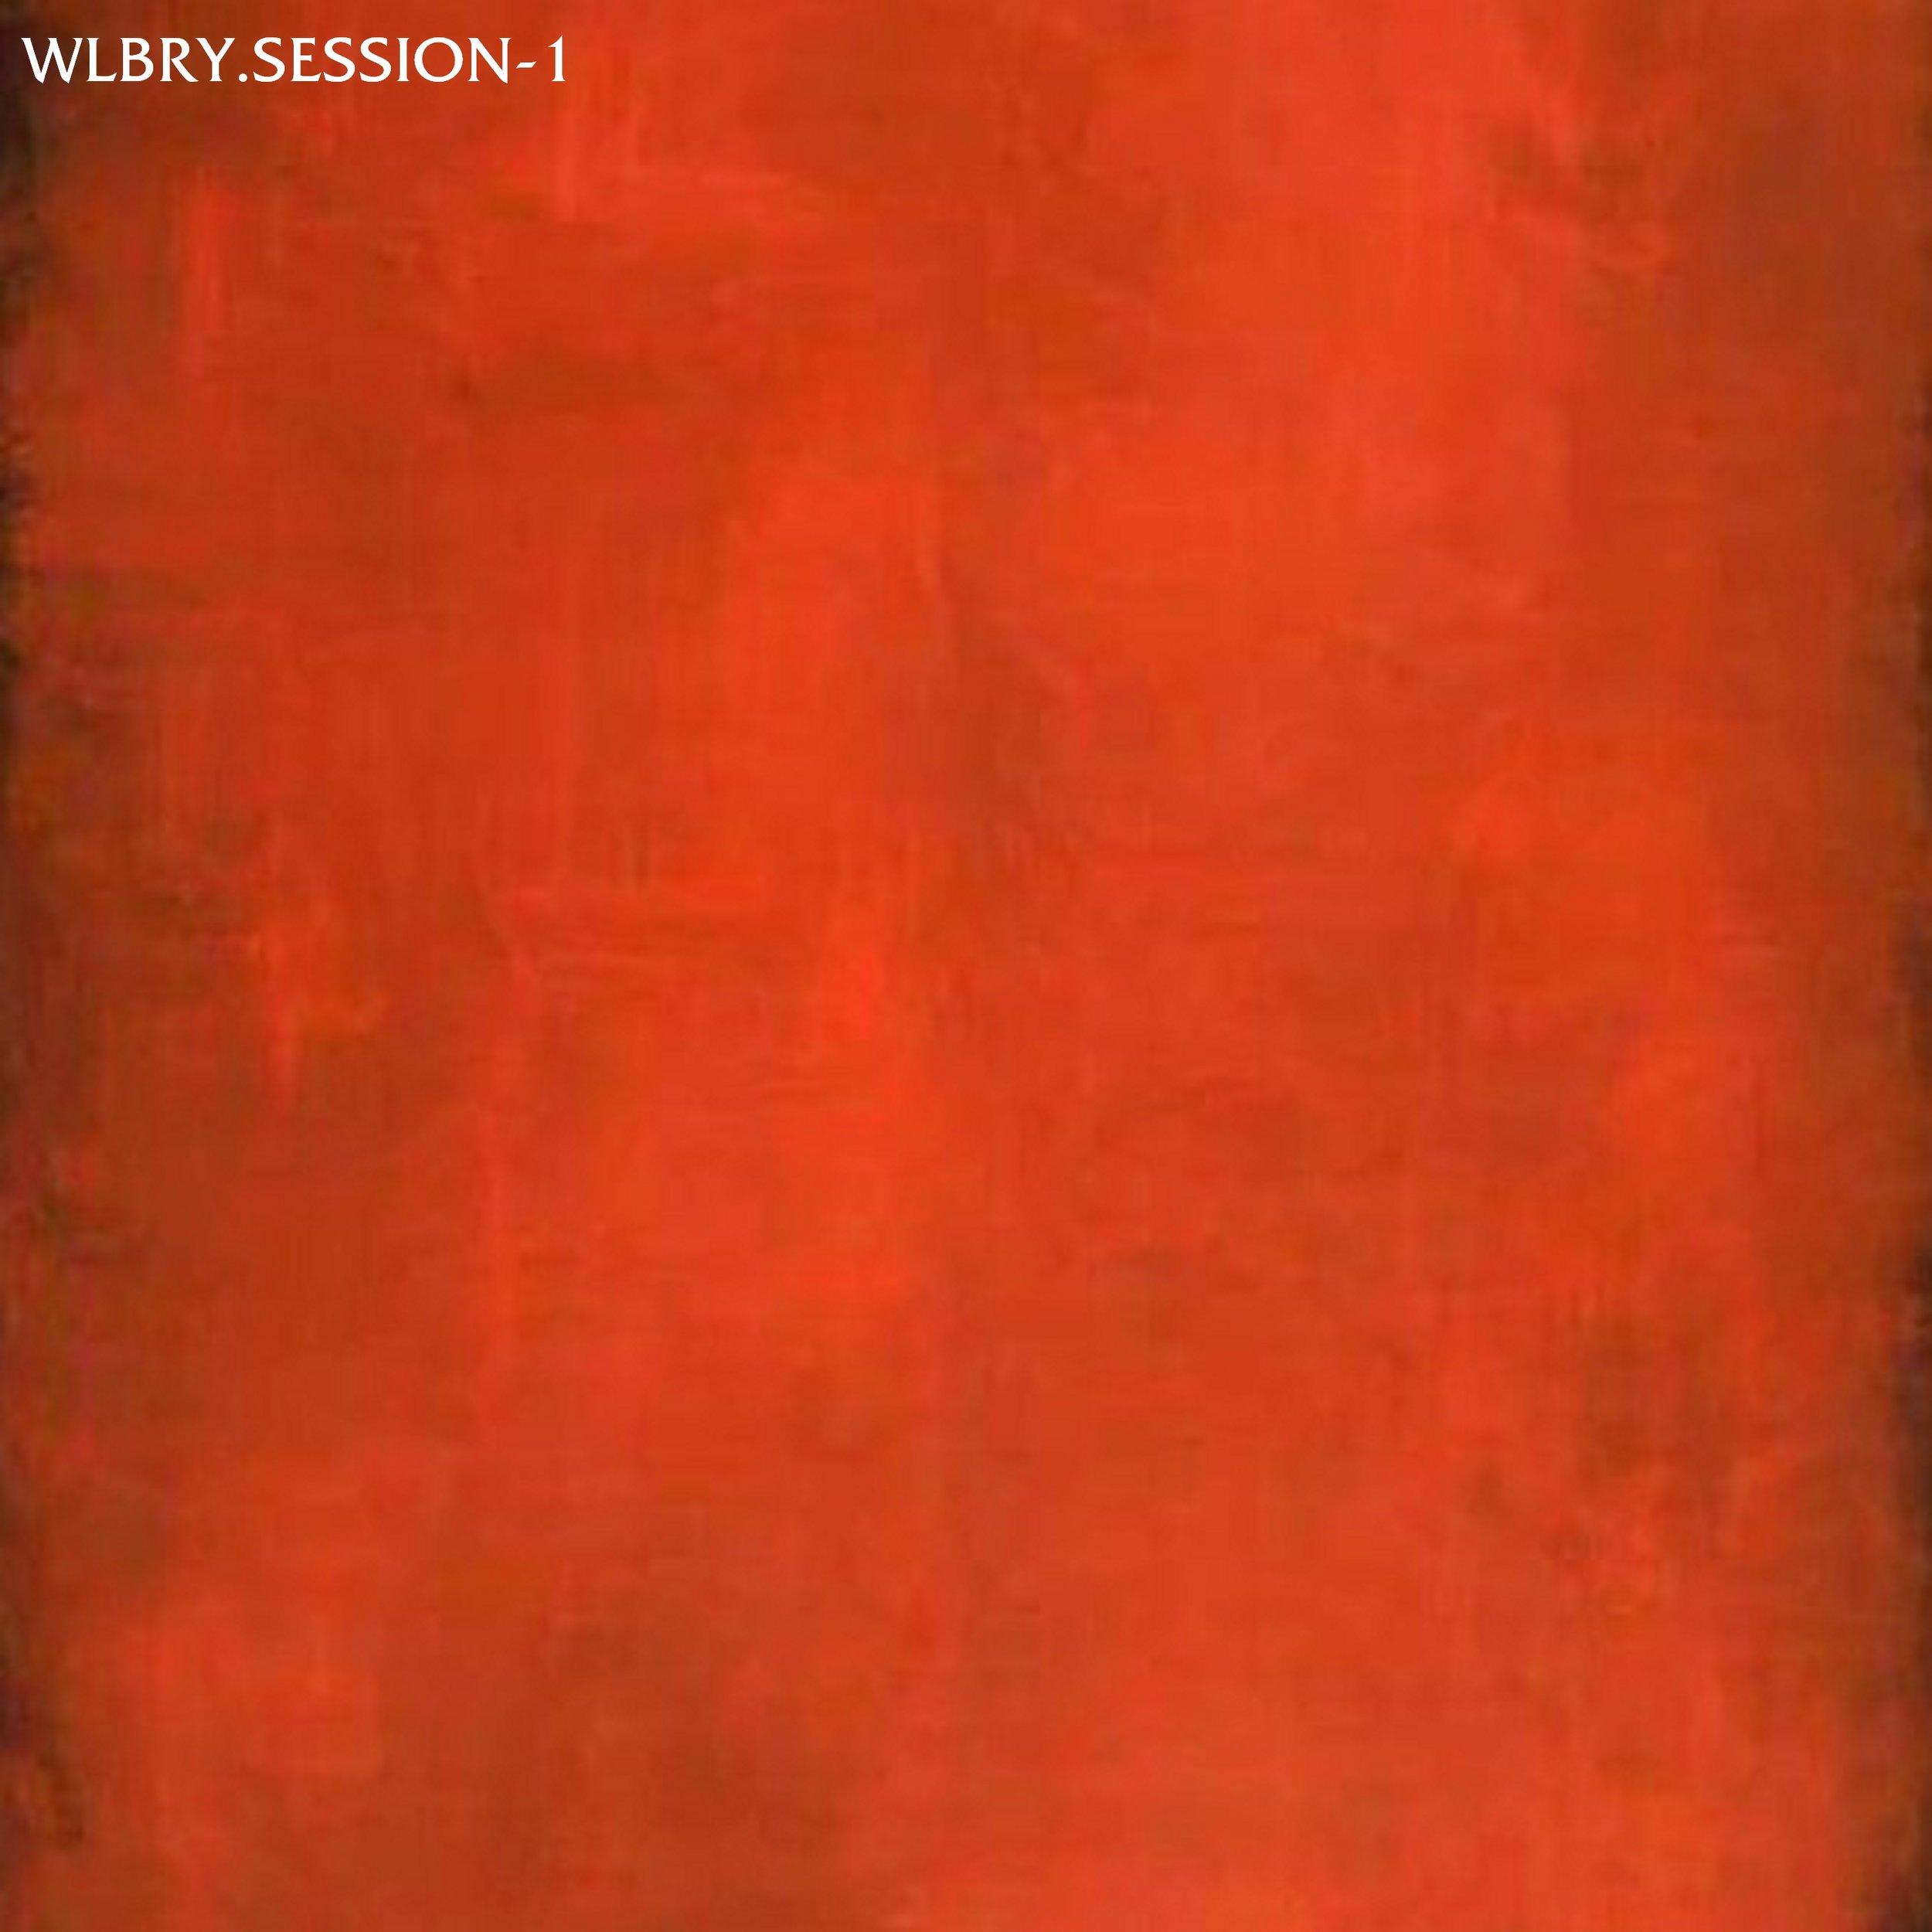 WLBRY.SESSION-1.jpg